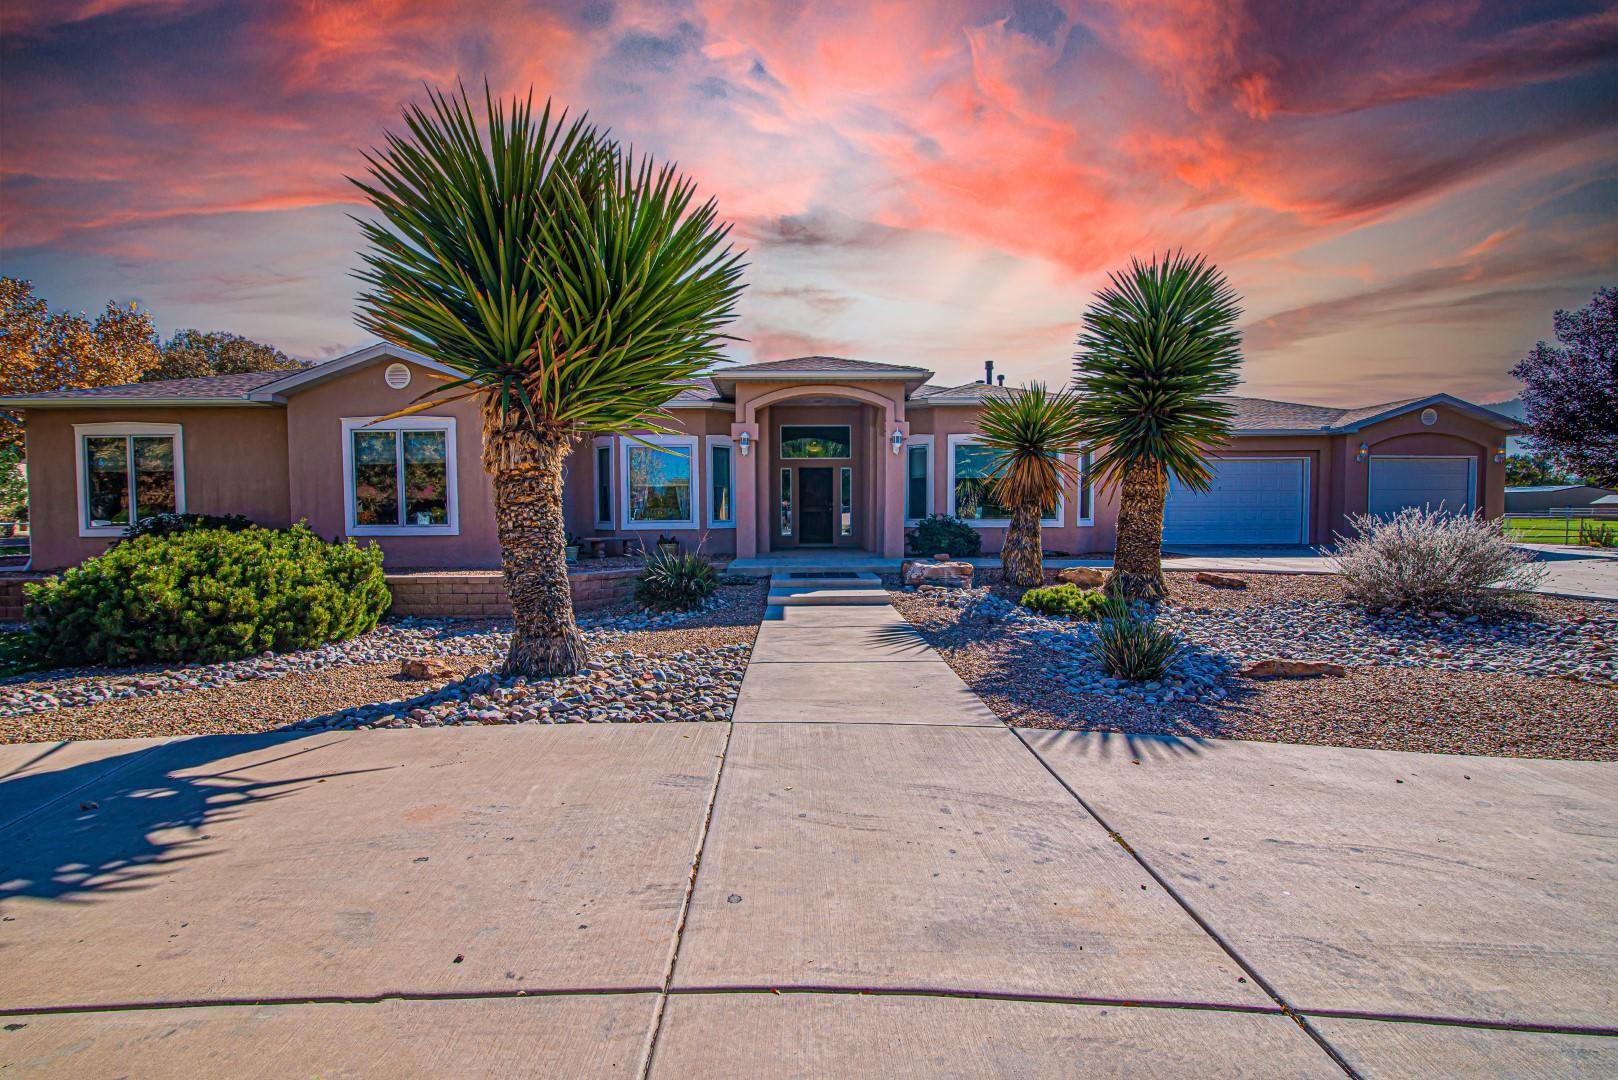 380 GARCIA Lane, Bosque Farms, NM 87068 - MLS#: 980567